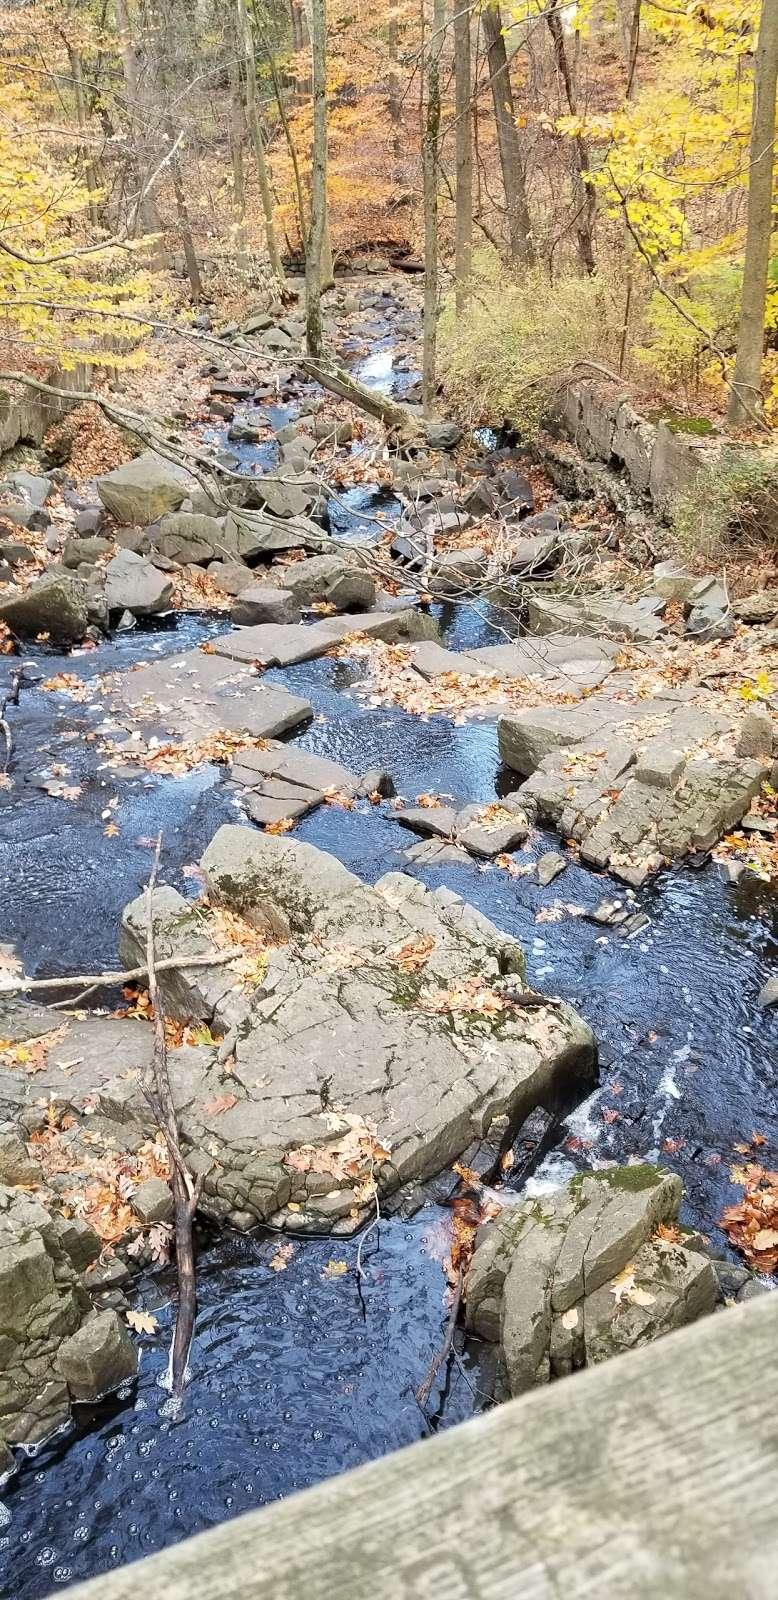 Flat Rock Brook Nature Center - park  | Photo 10 of 10 | Address: 288 Jones Rd, Englewood, NJ 07631, USA